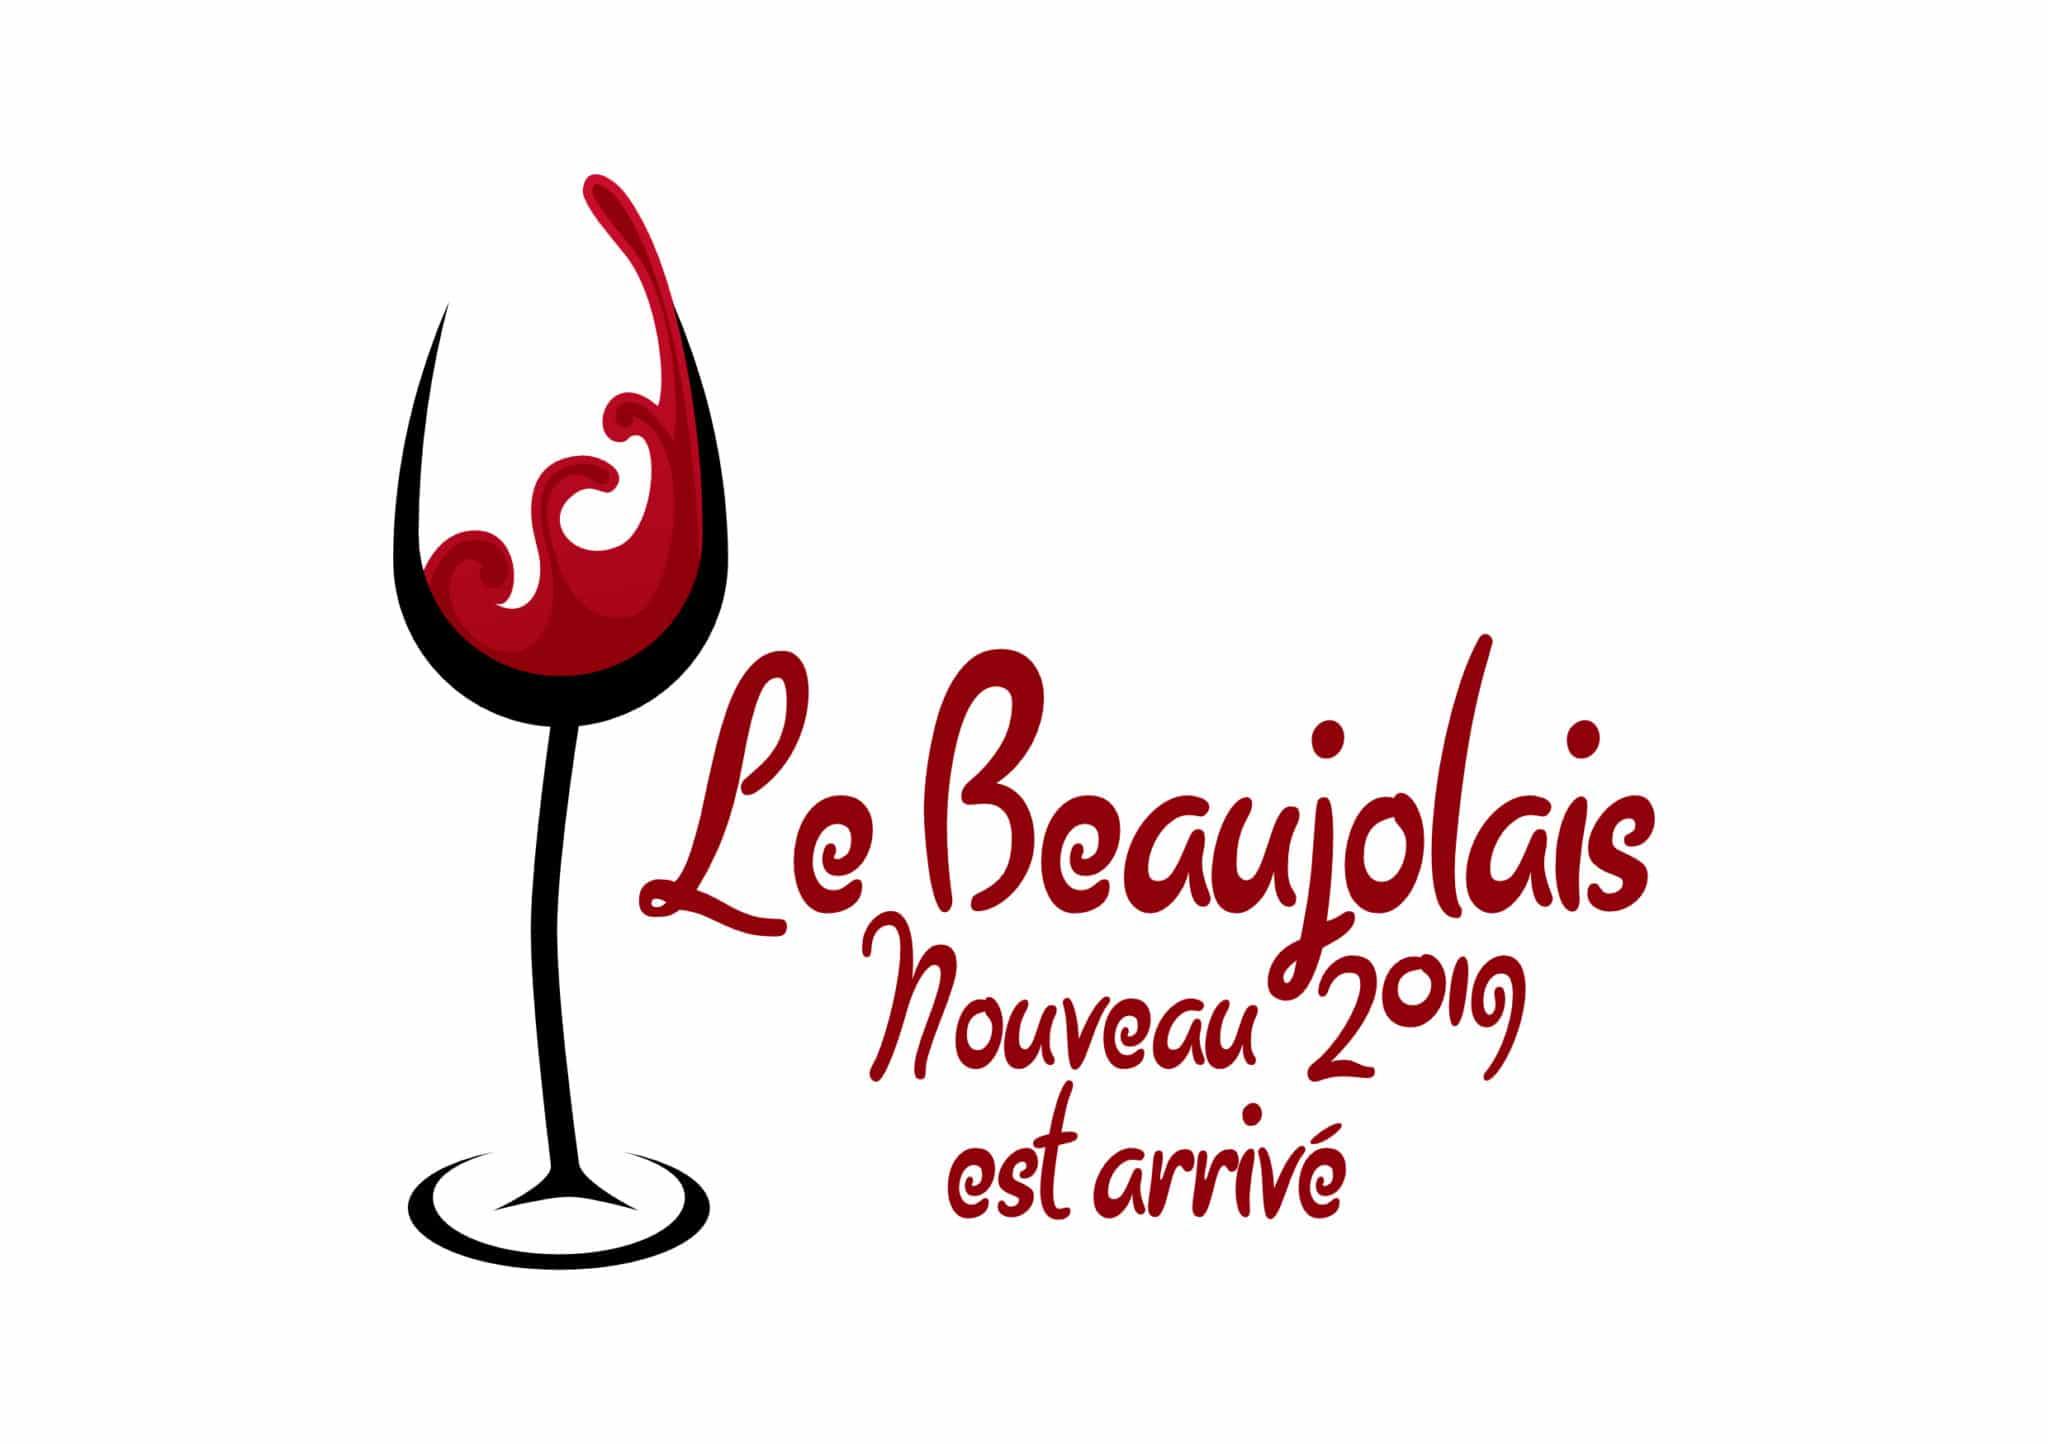 (Češtiny) Beaujolais nouveau